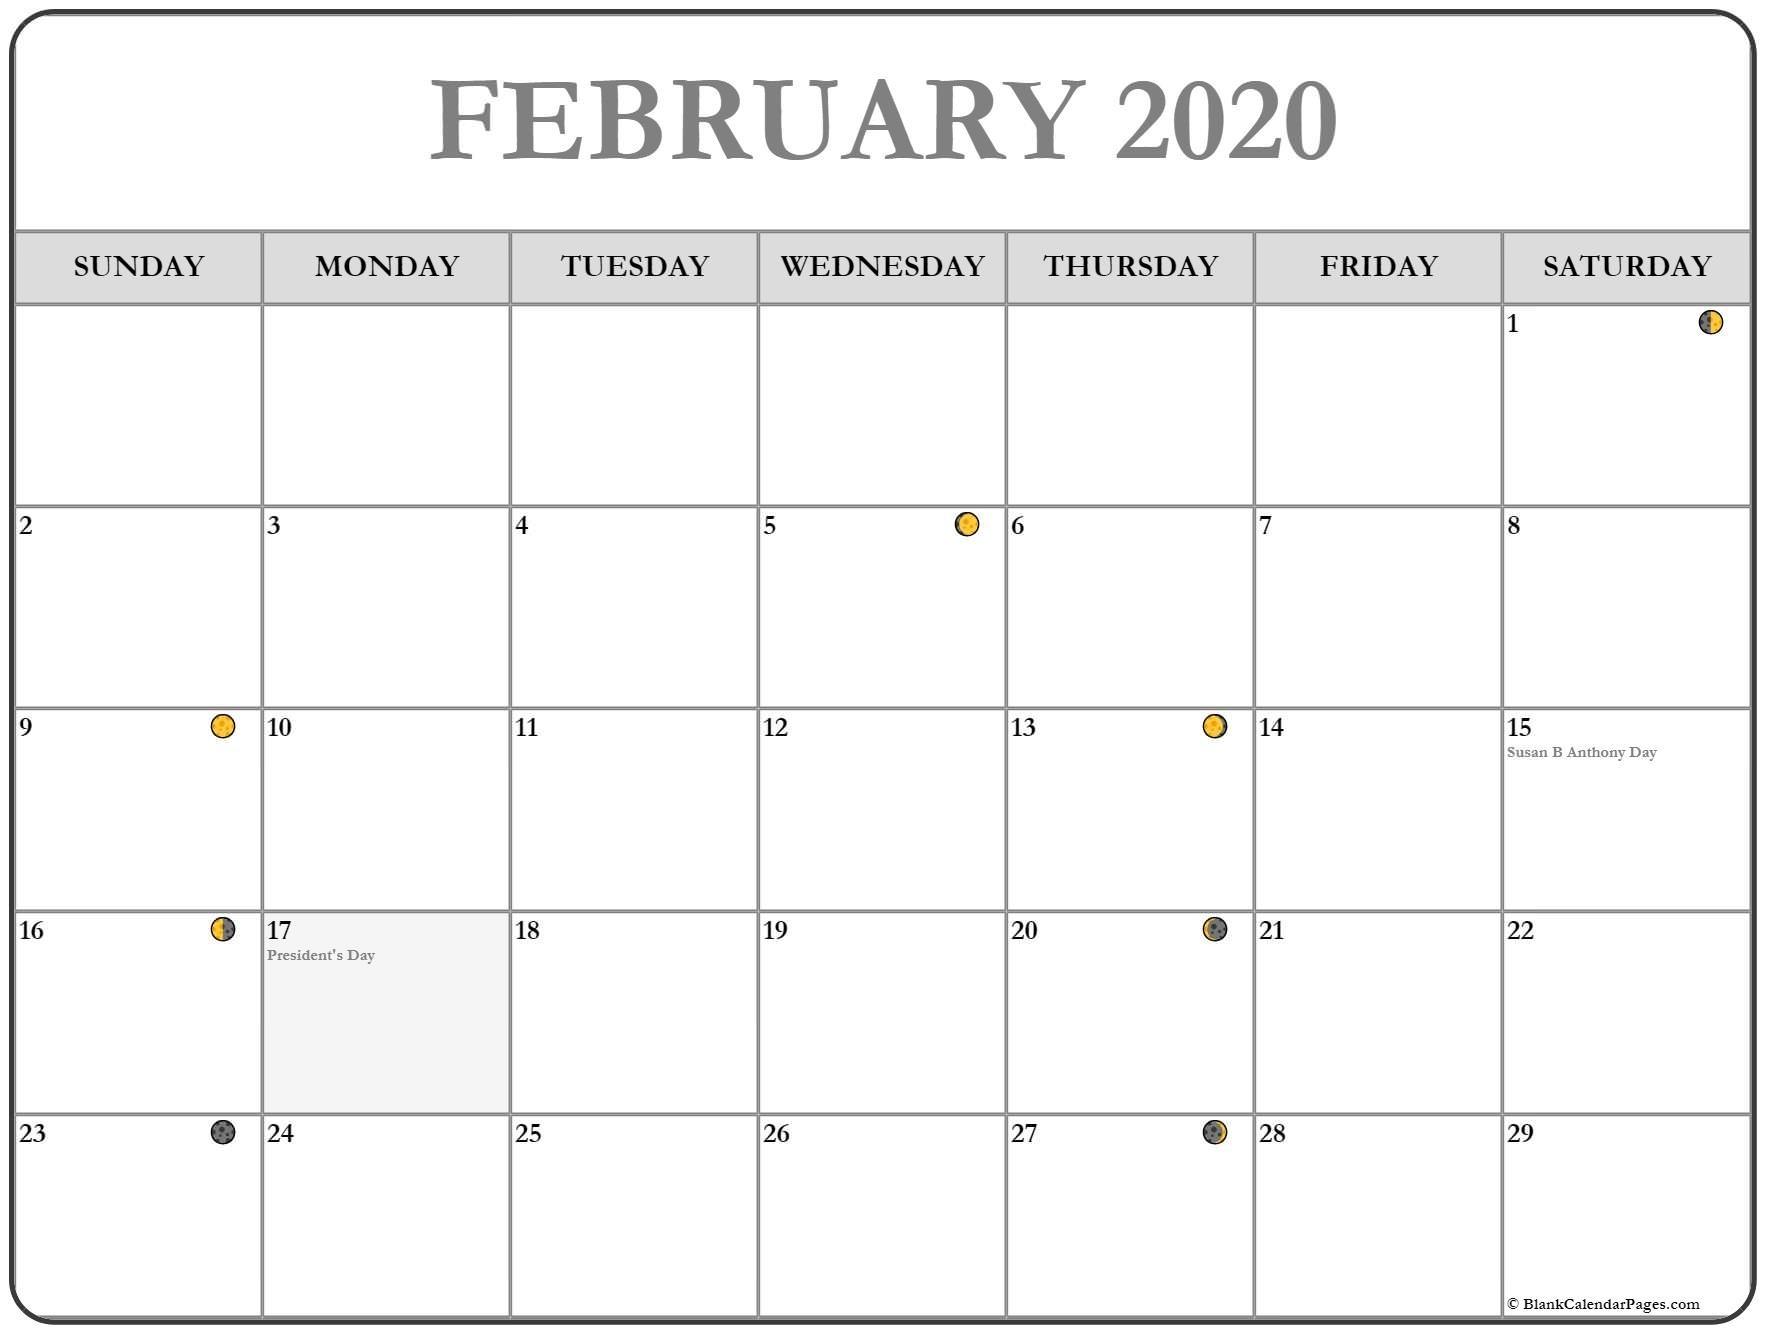 February 2020 Lunar Calendar | Moon Phase Calendar  Solar Lunar Calendar - 2020